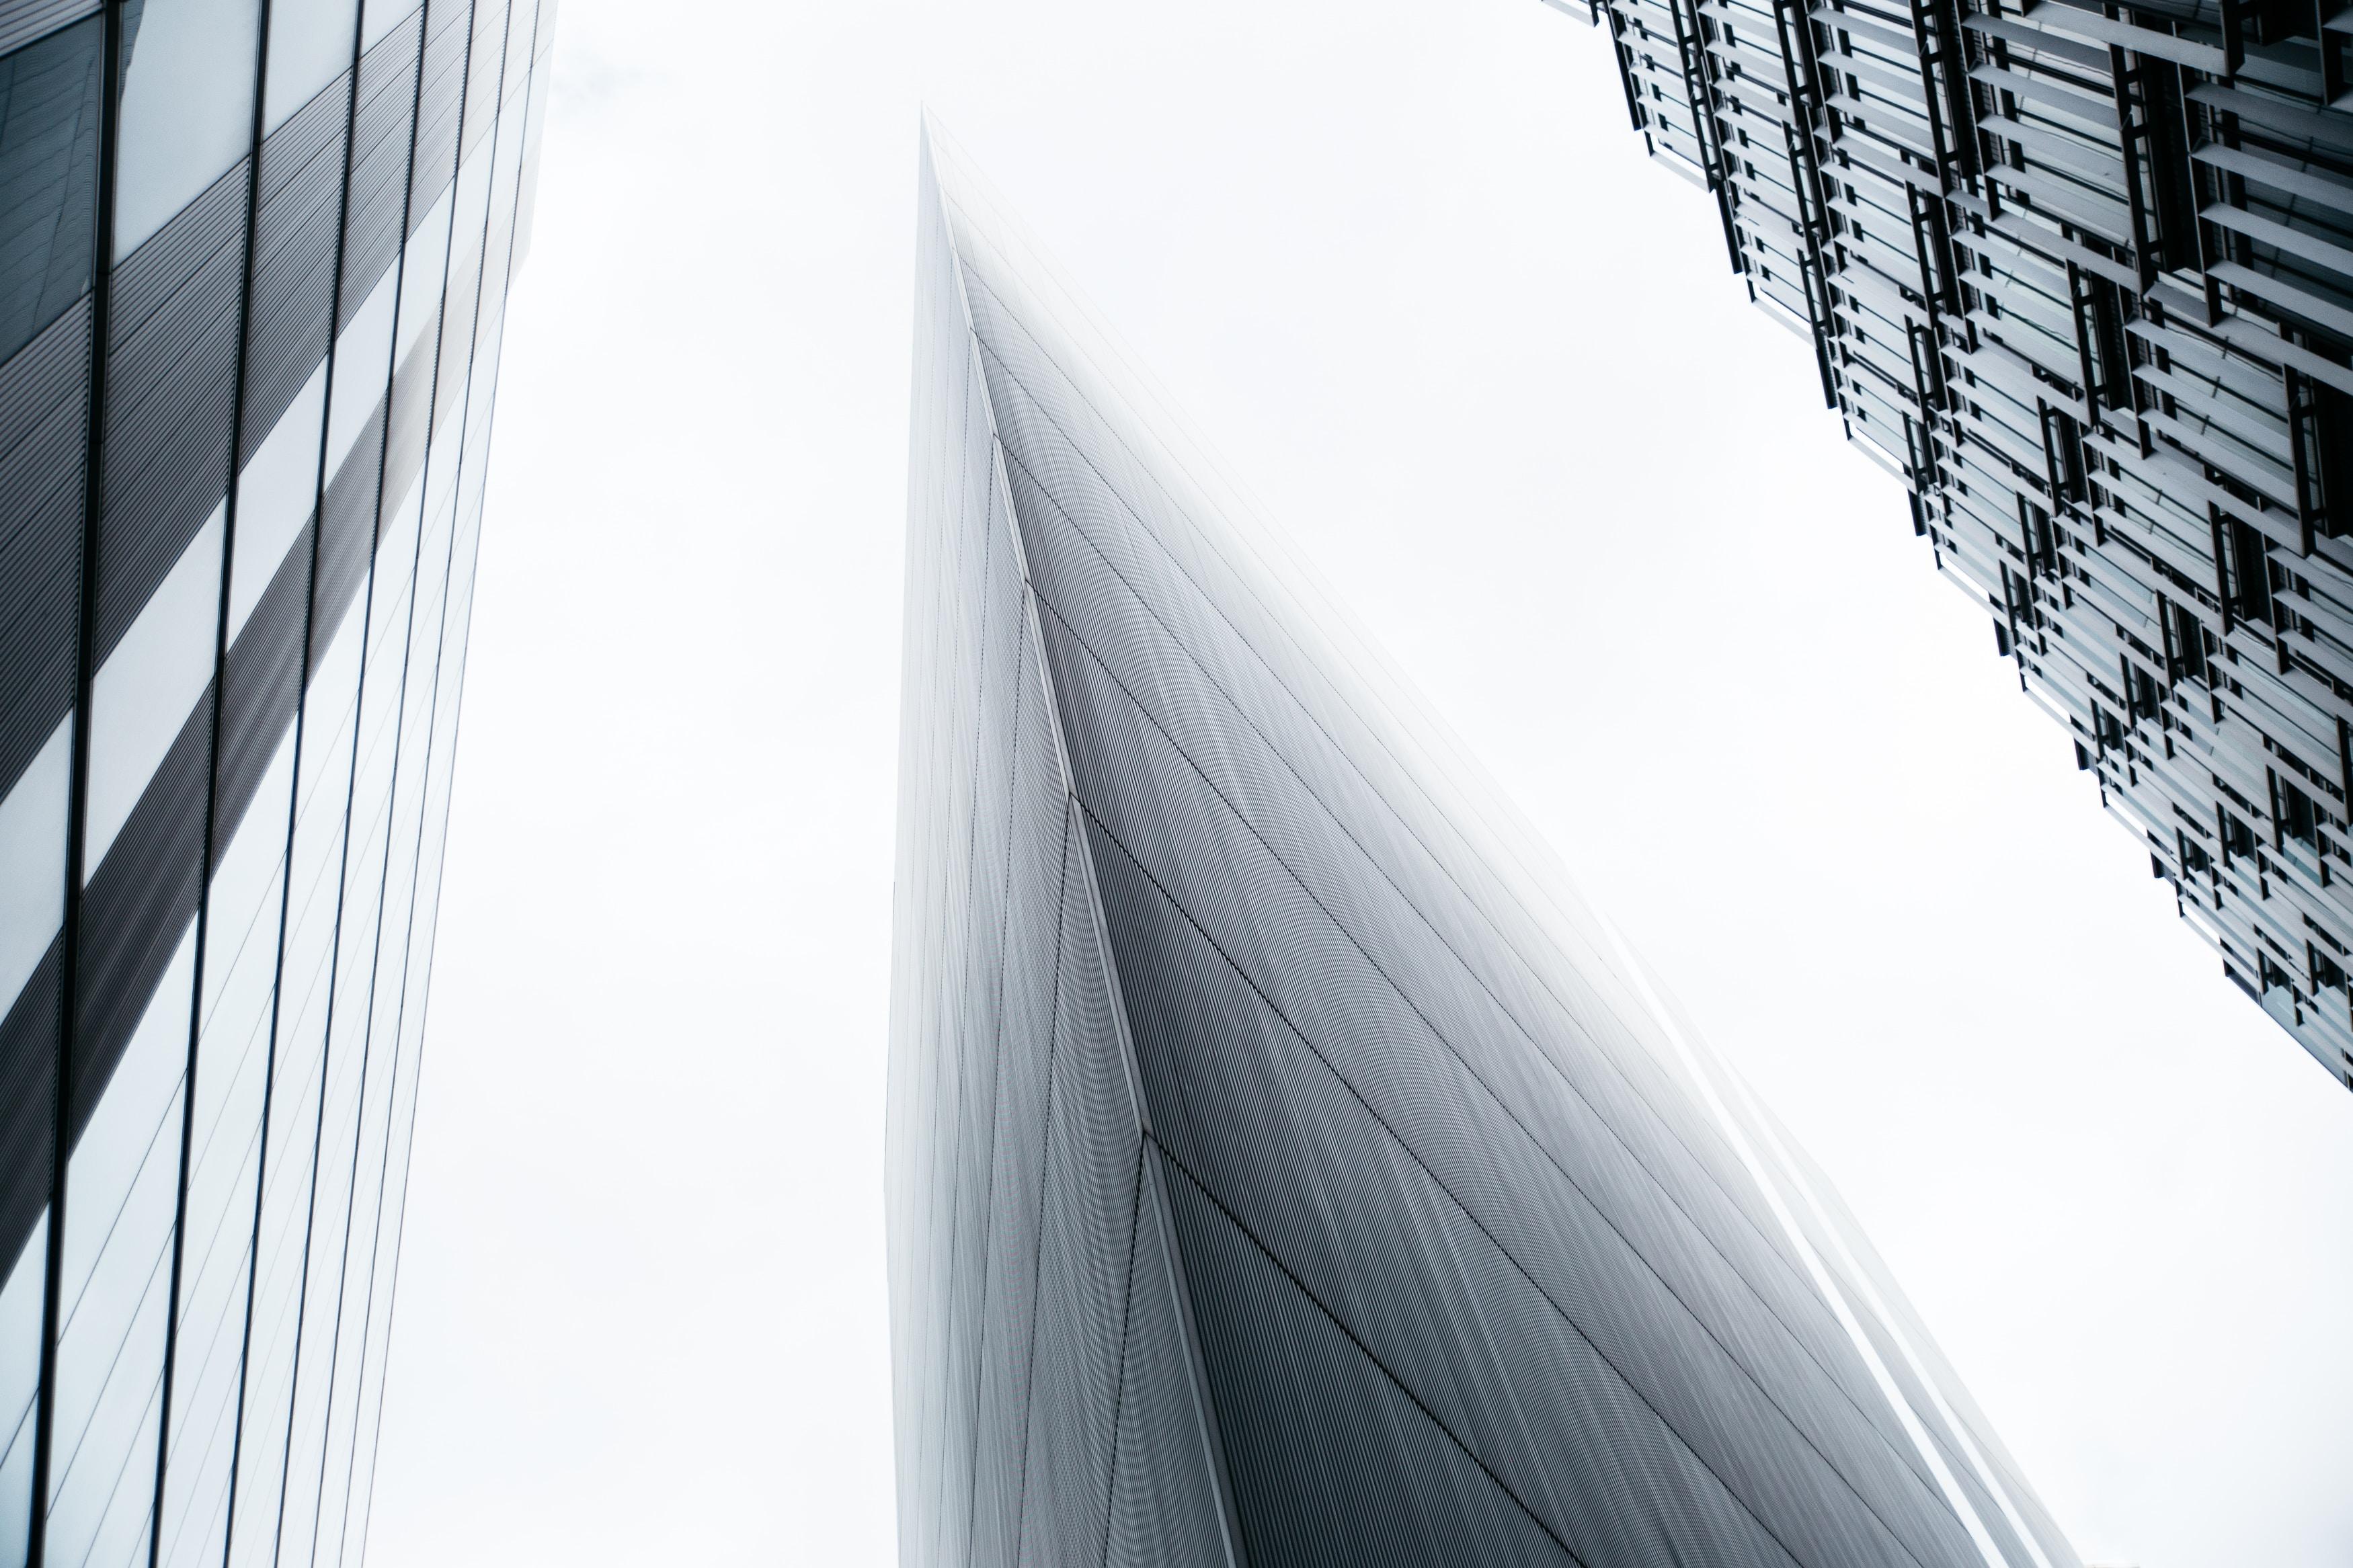 curtain wall buildings